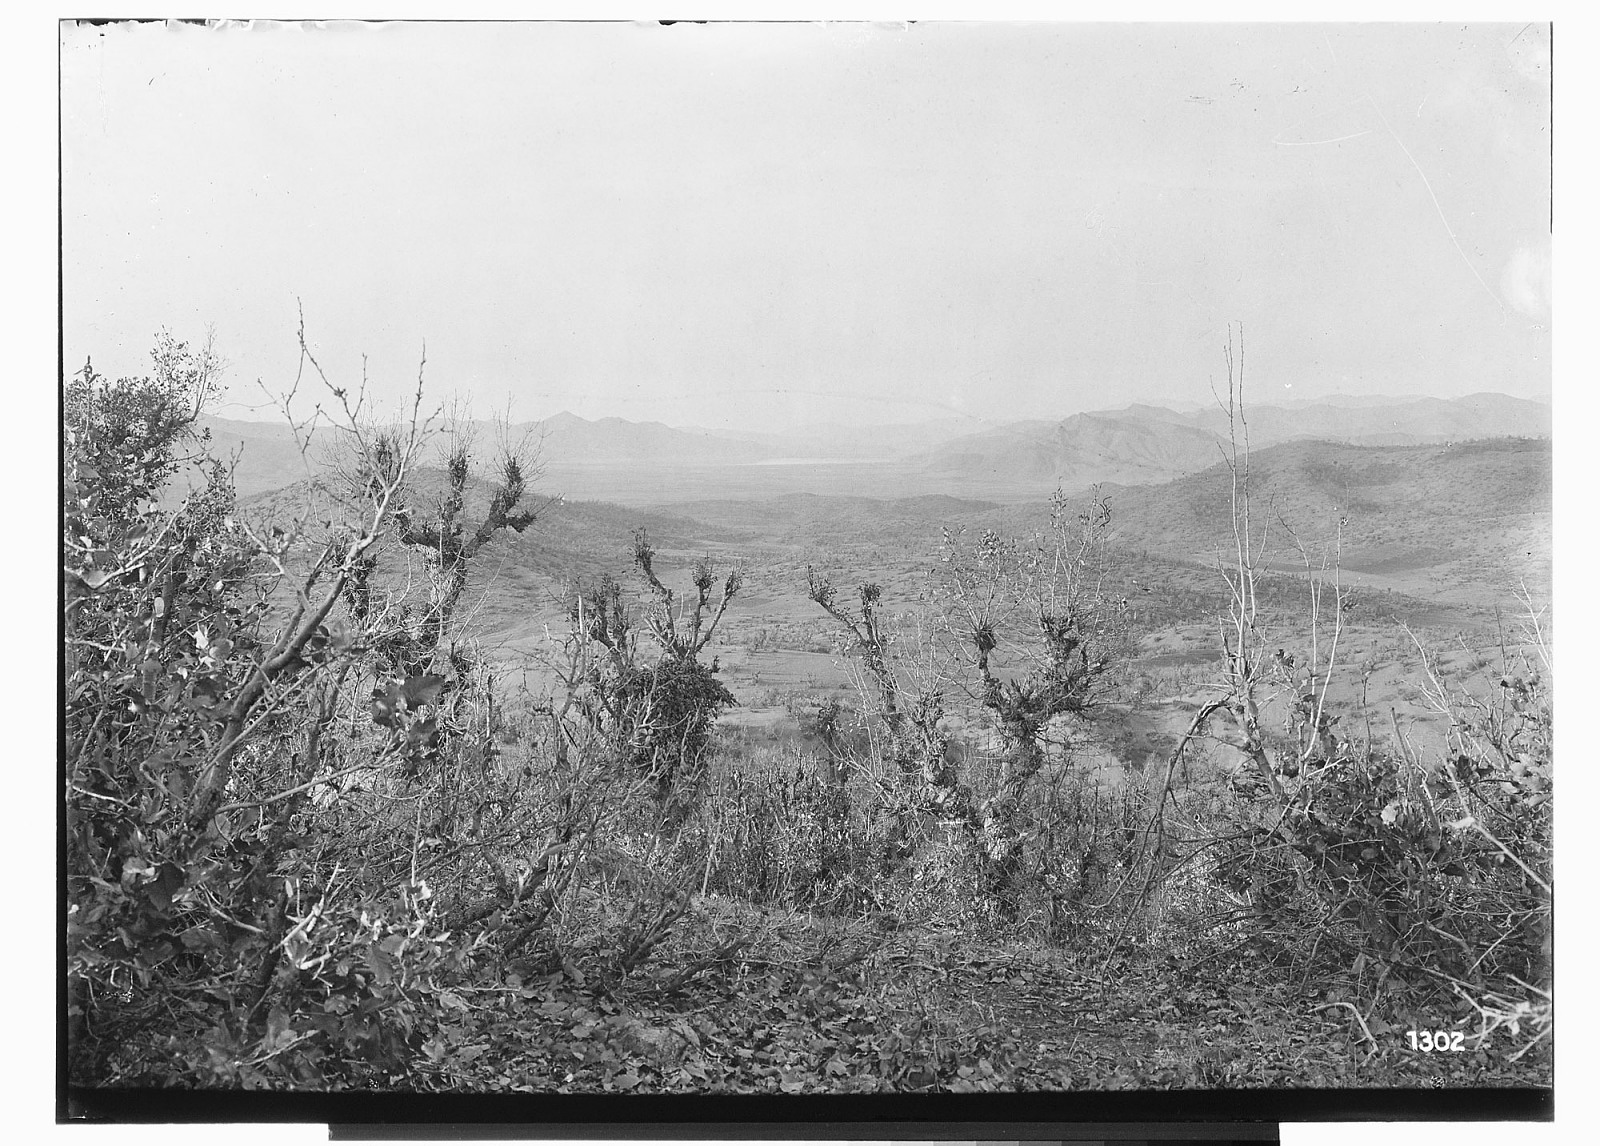 Plain Black Background Landscape